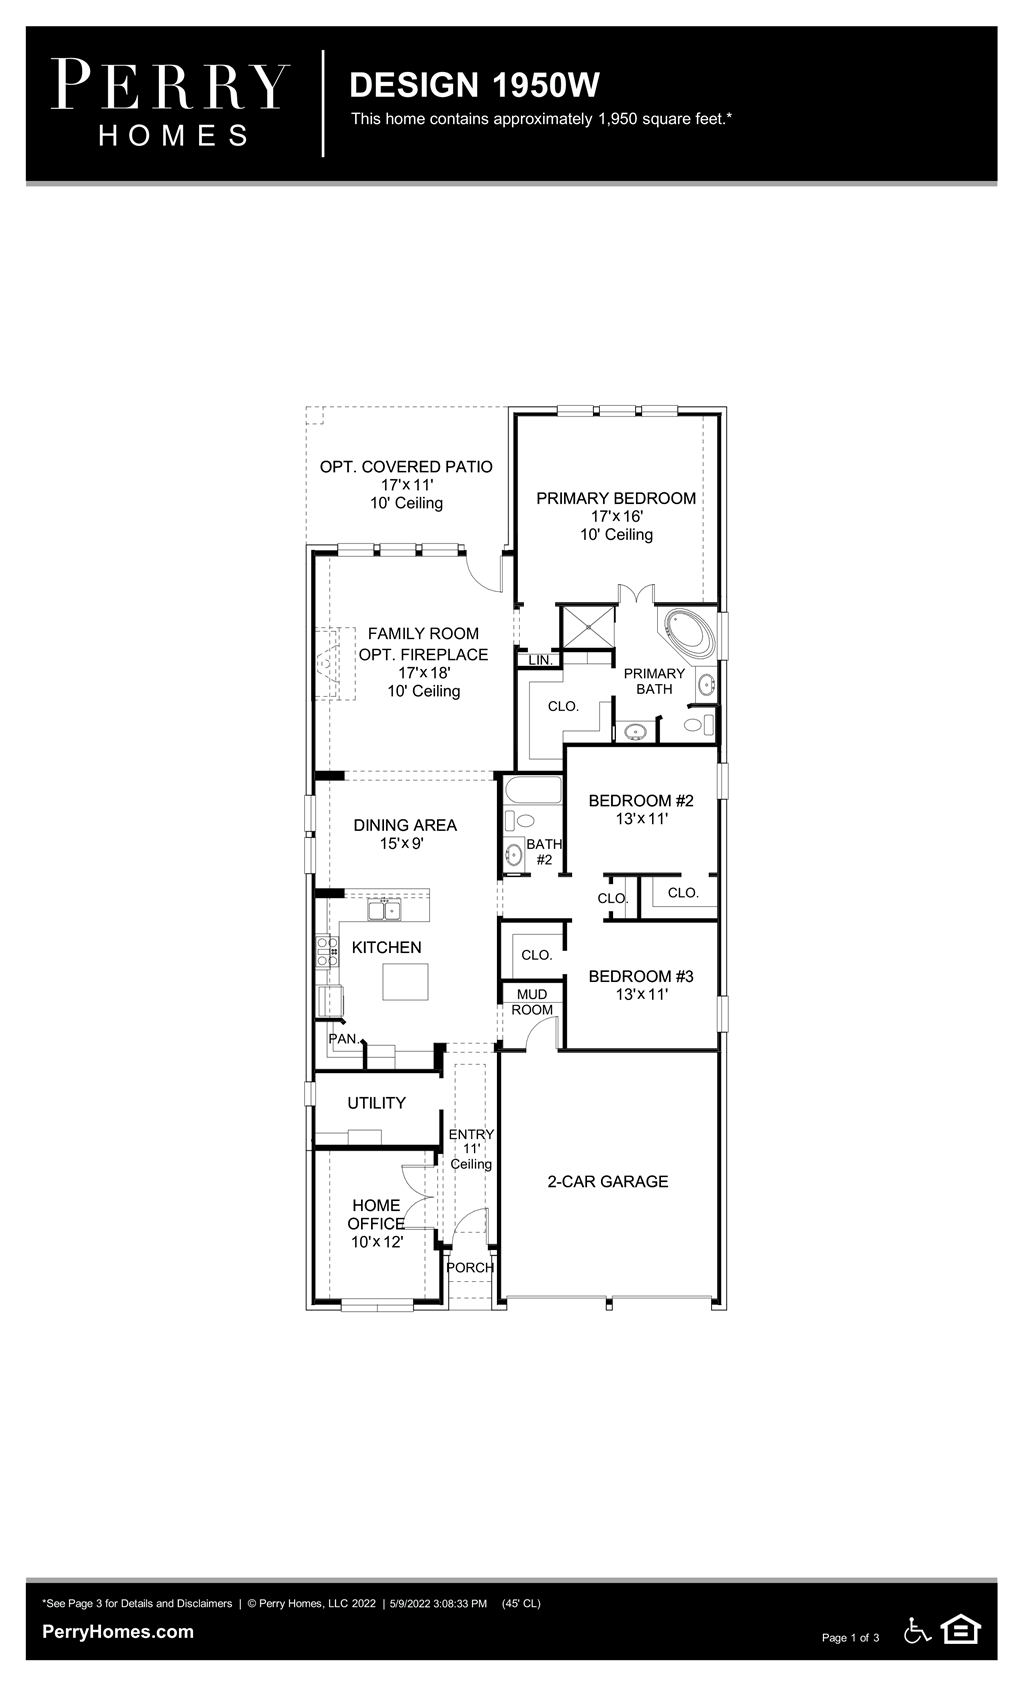 Floor Plan for 1950W